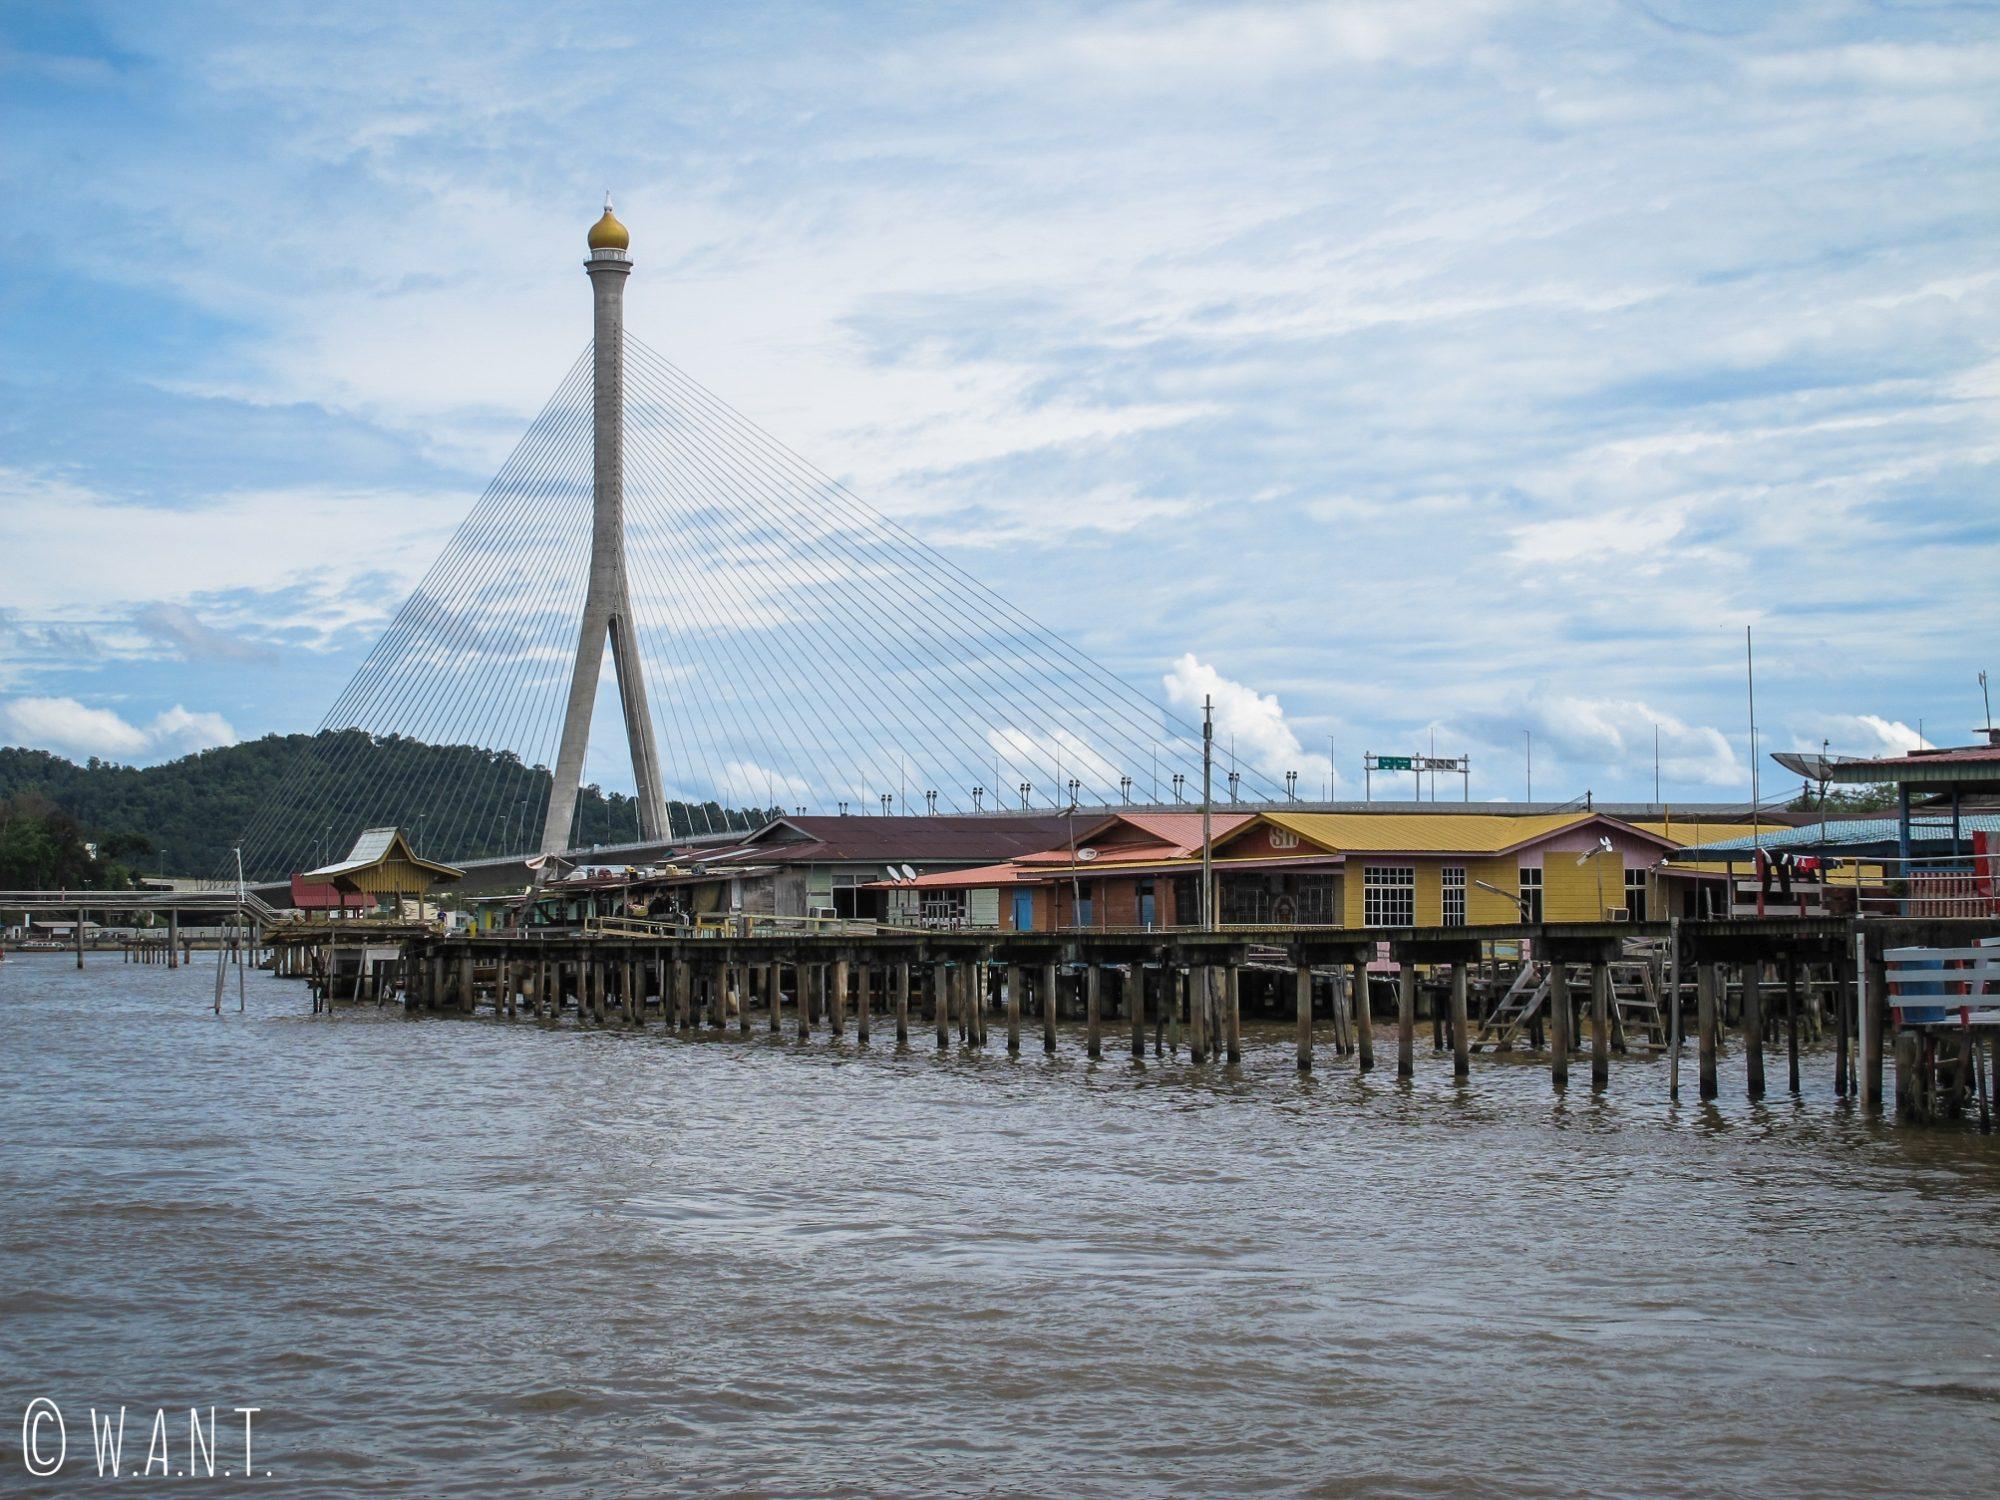 Village flottant de Kampong Ayer et pont Sungai Kebun à Bandar Seri Begawan